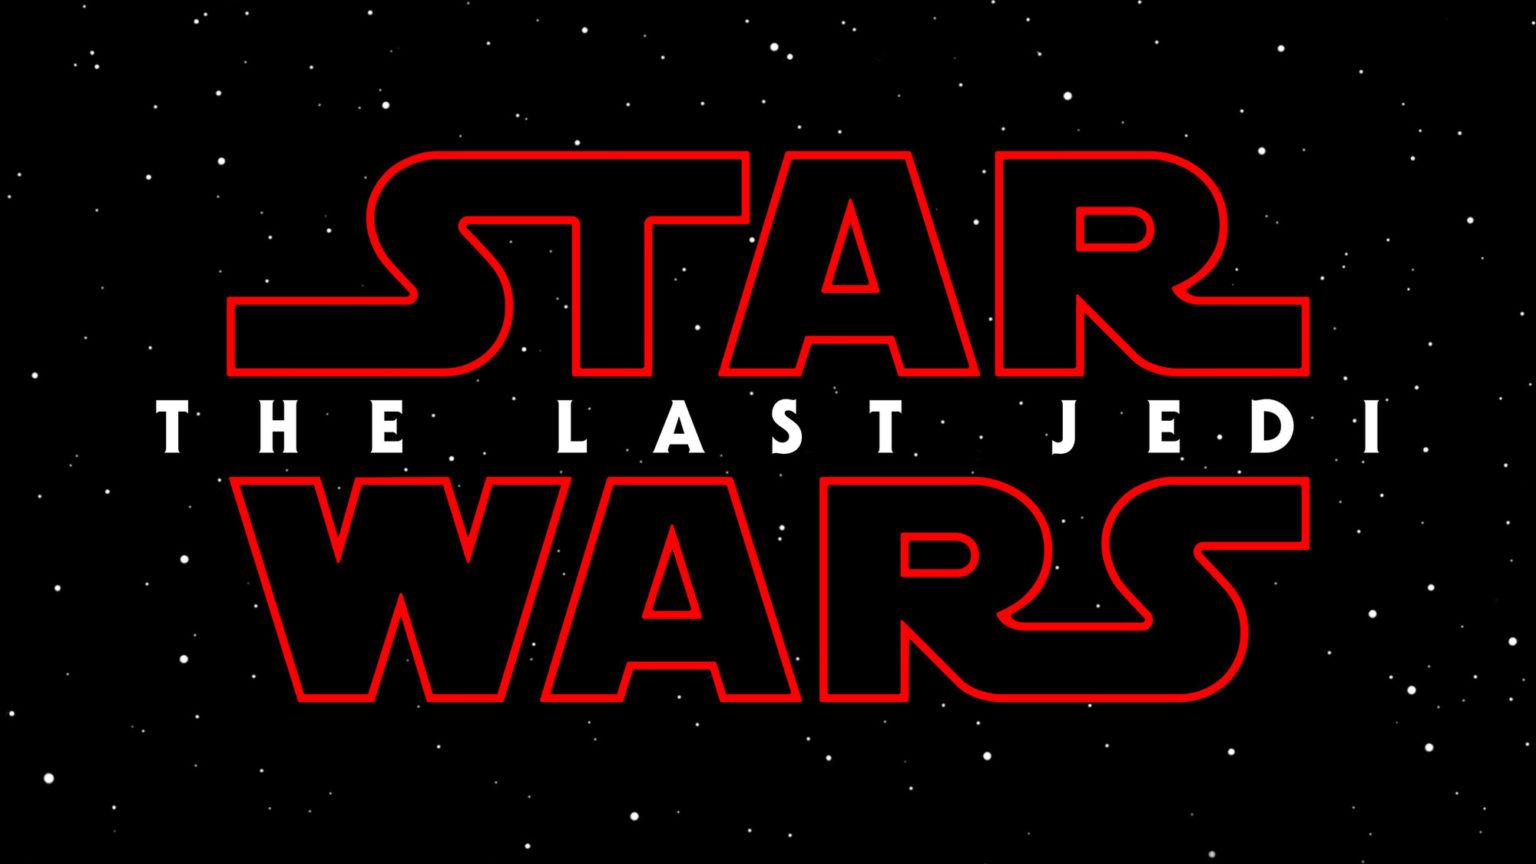 The Last Jedi lesz a Star Wars 8 hivatalos címe